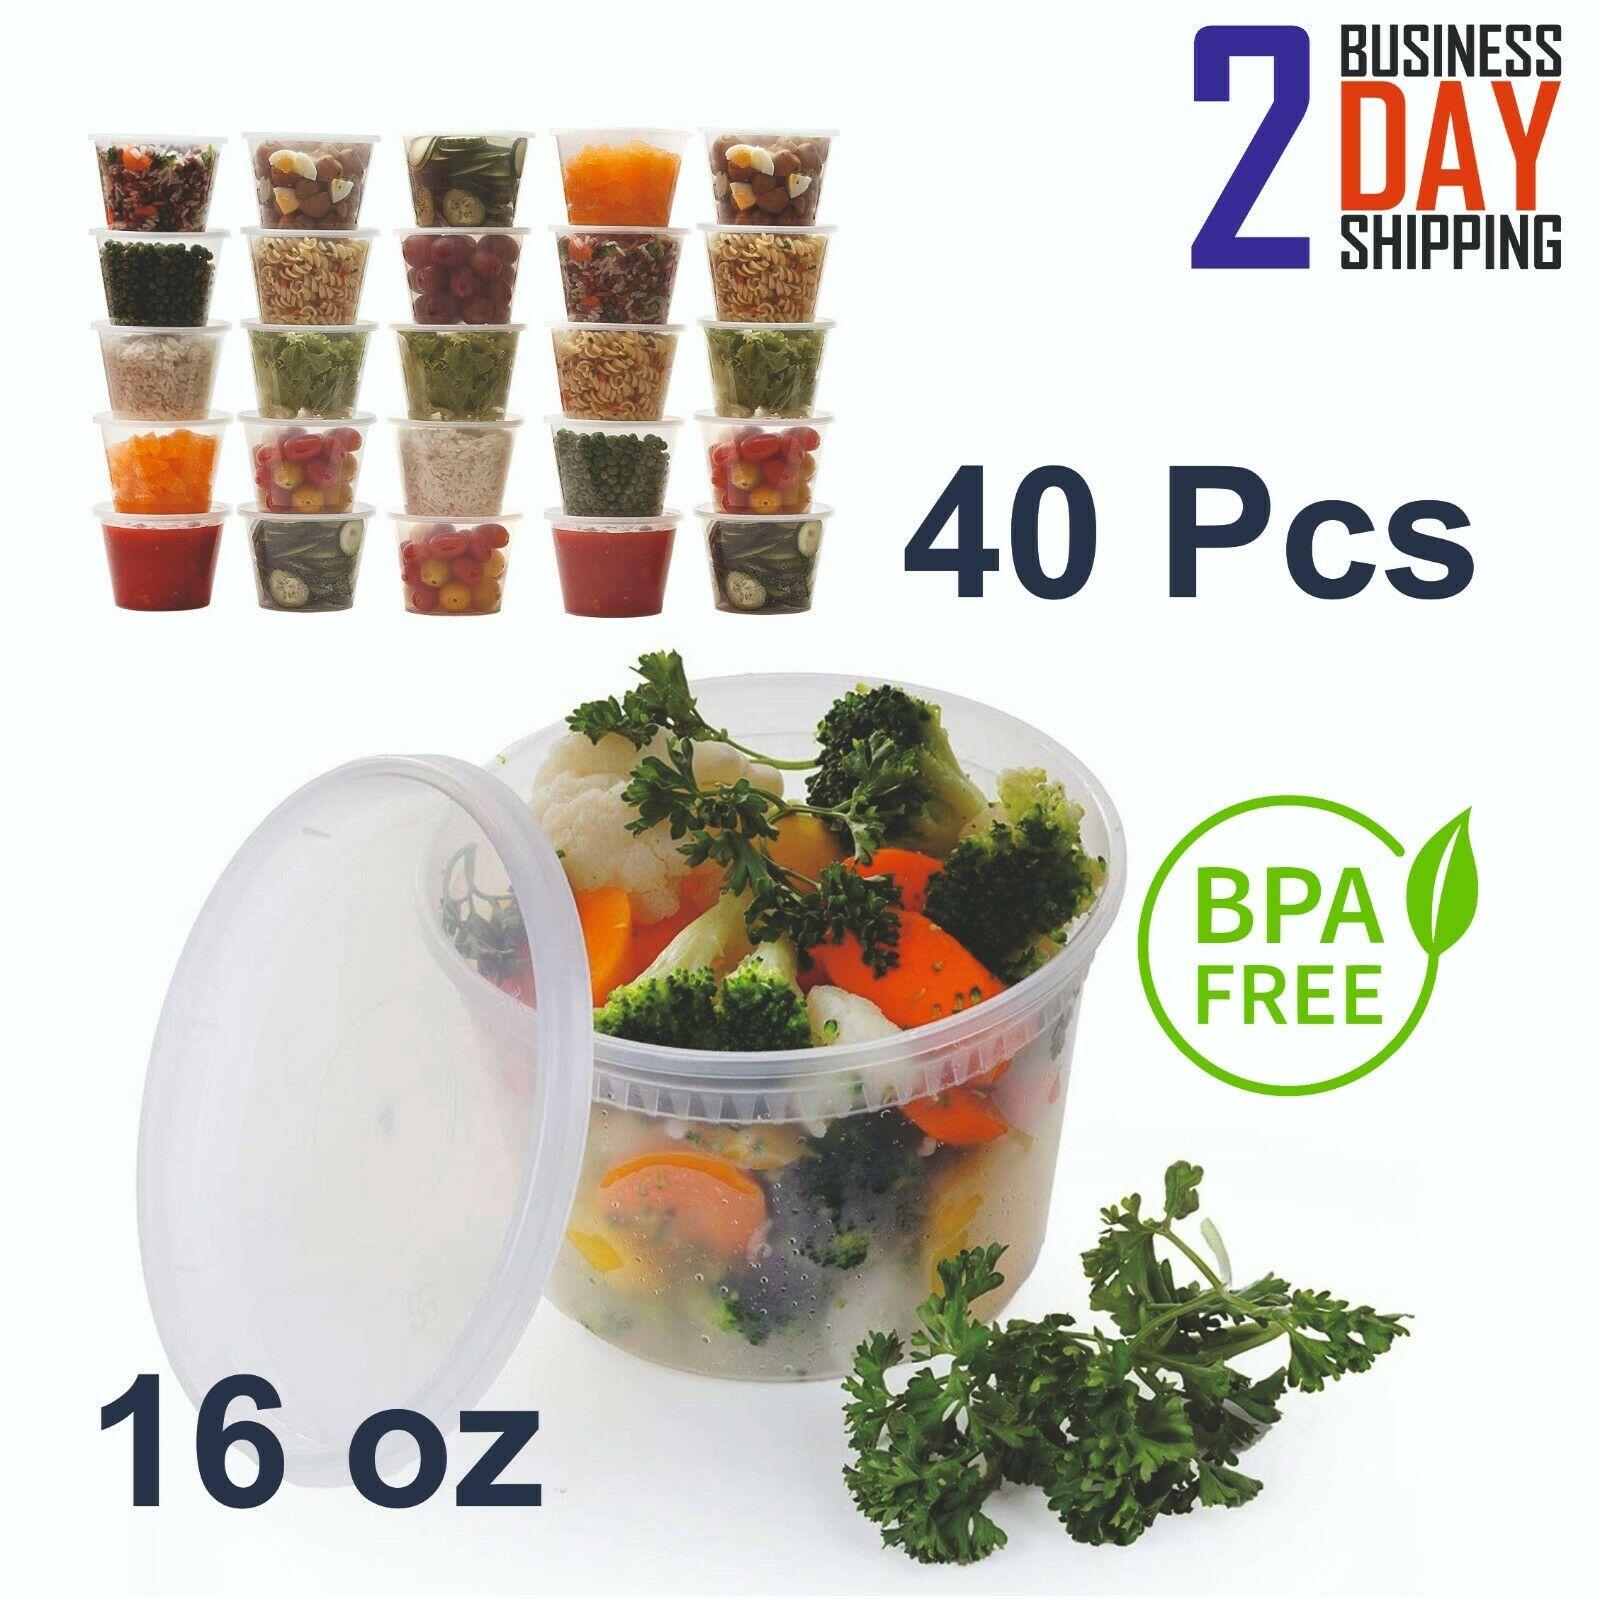 40 Pcs 16oz Large Plastic Food Storage Containers Set With Lids Durable Reusable 1